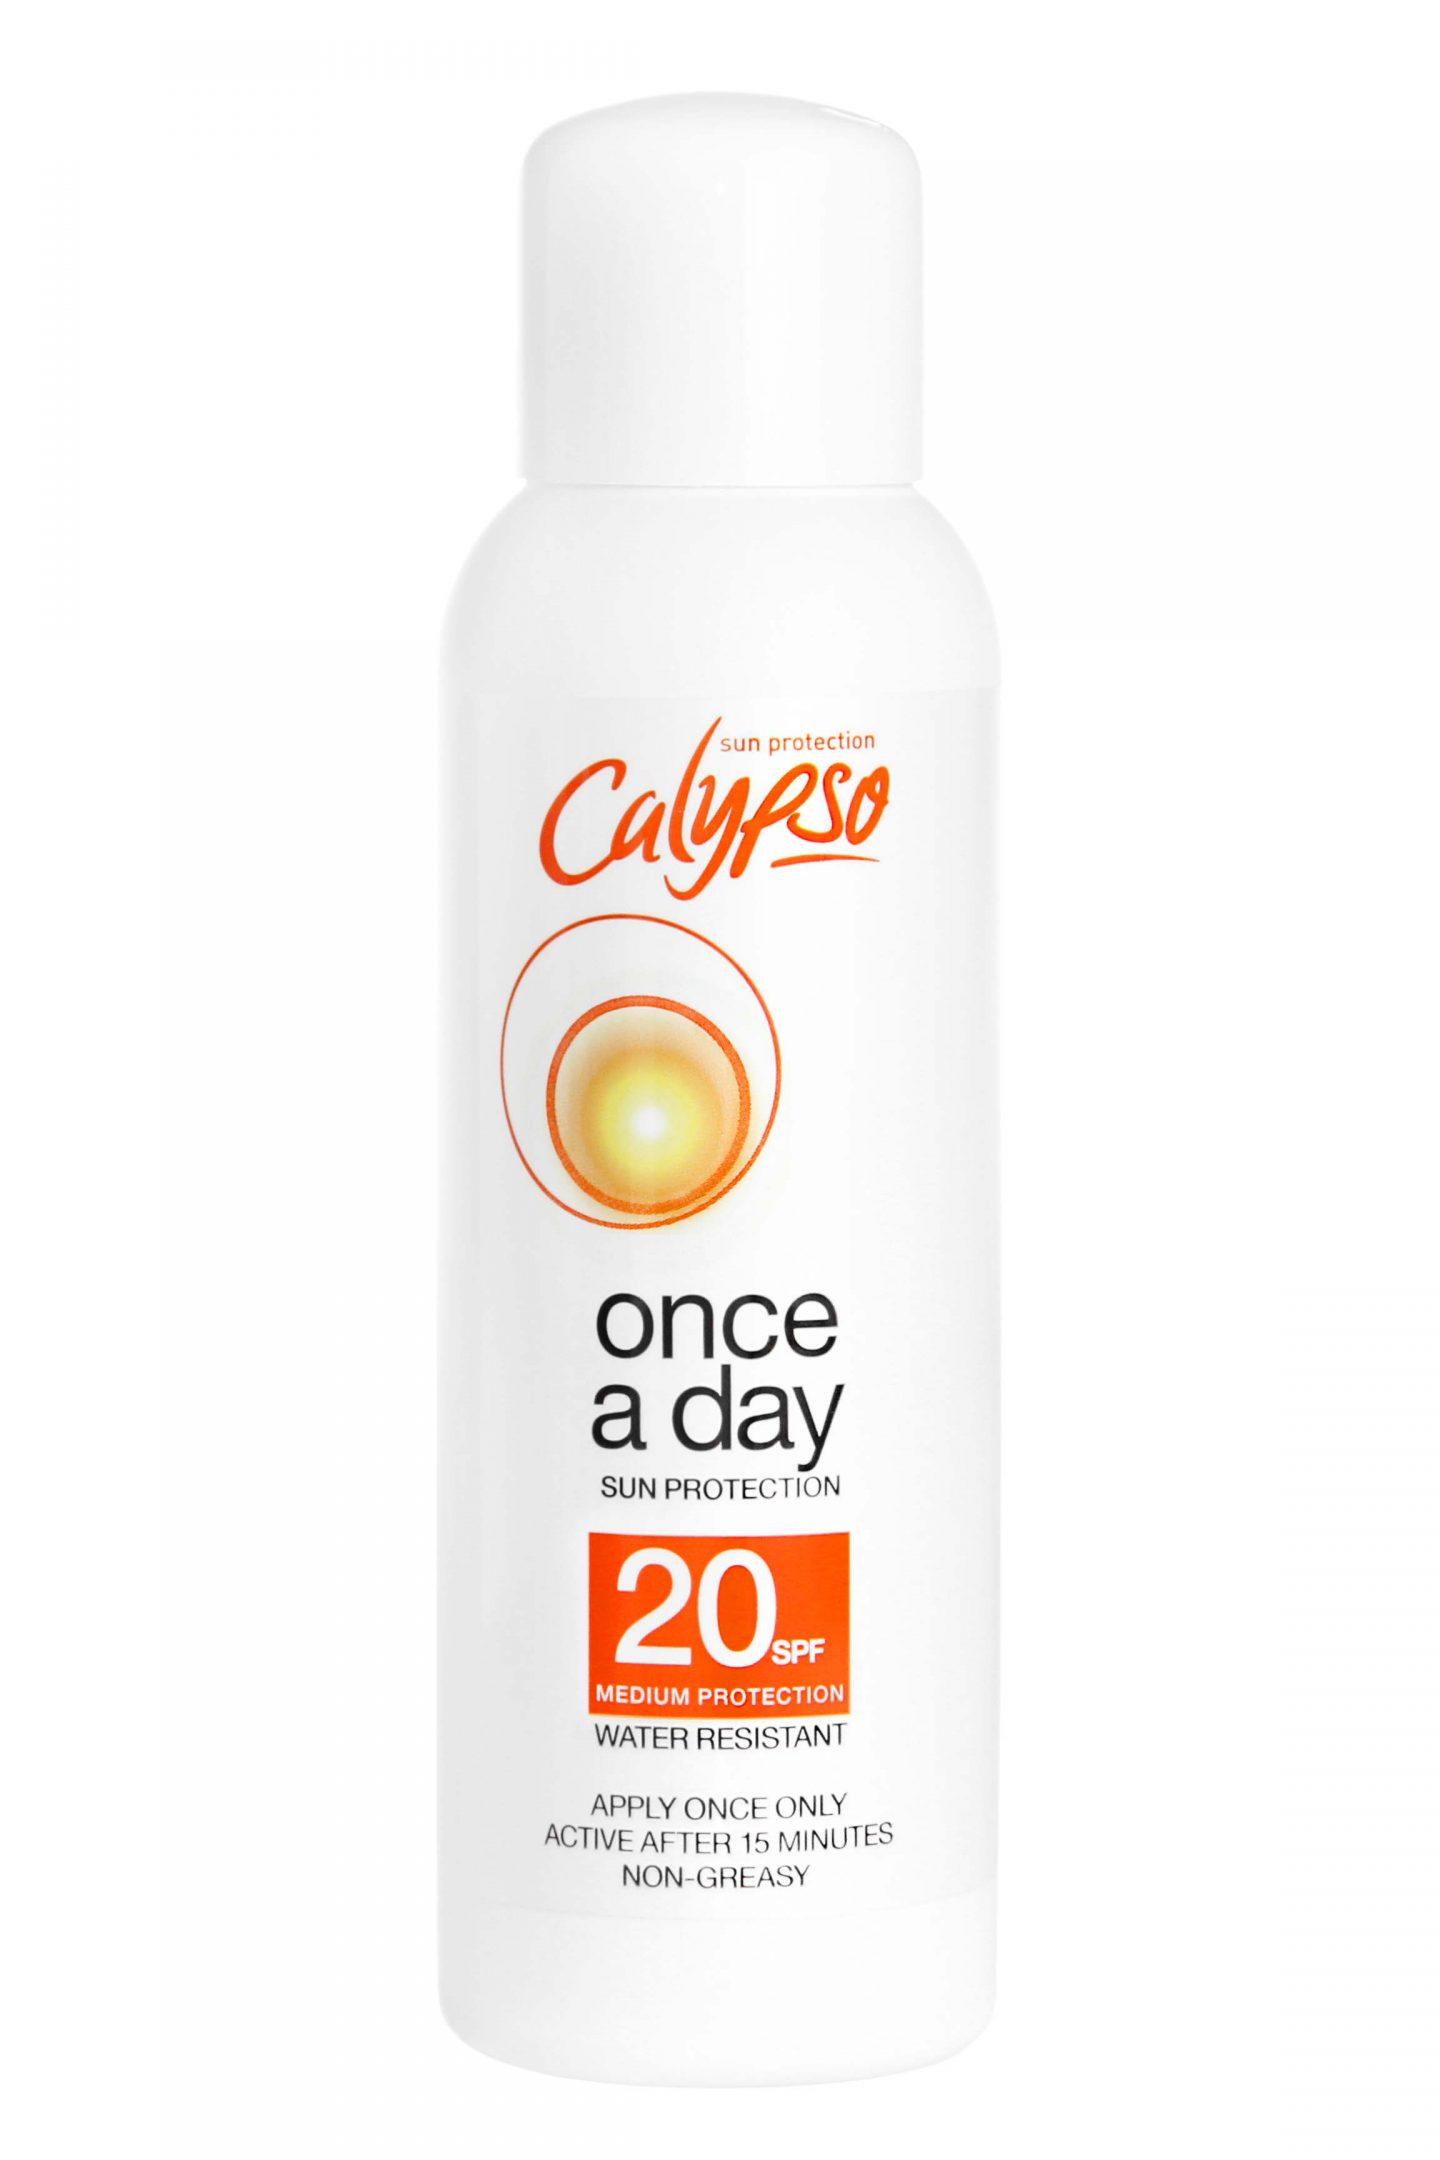 Calypso Sun Cream Review*